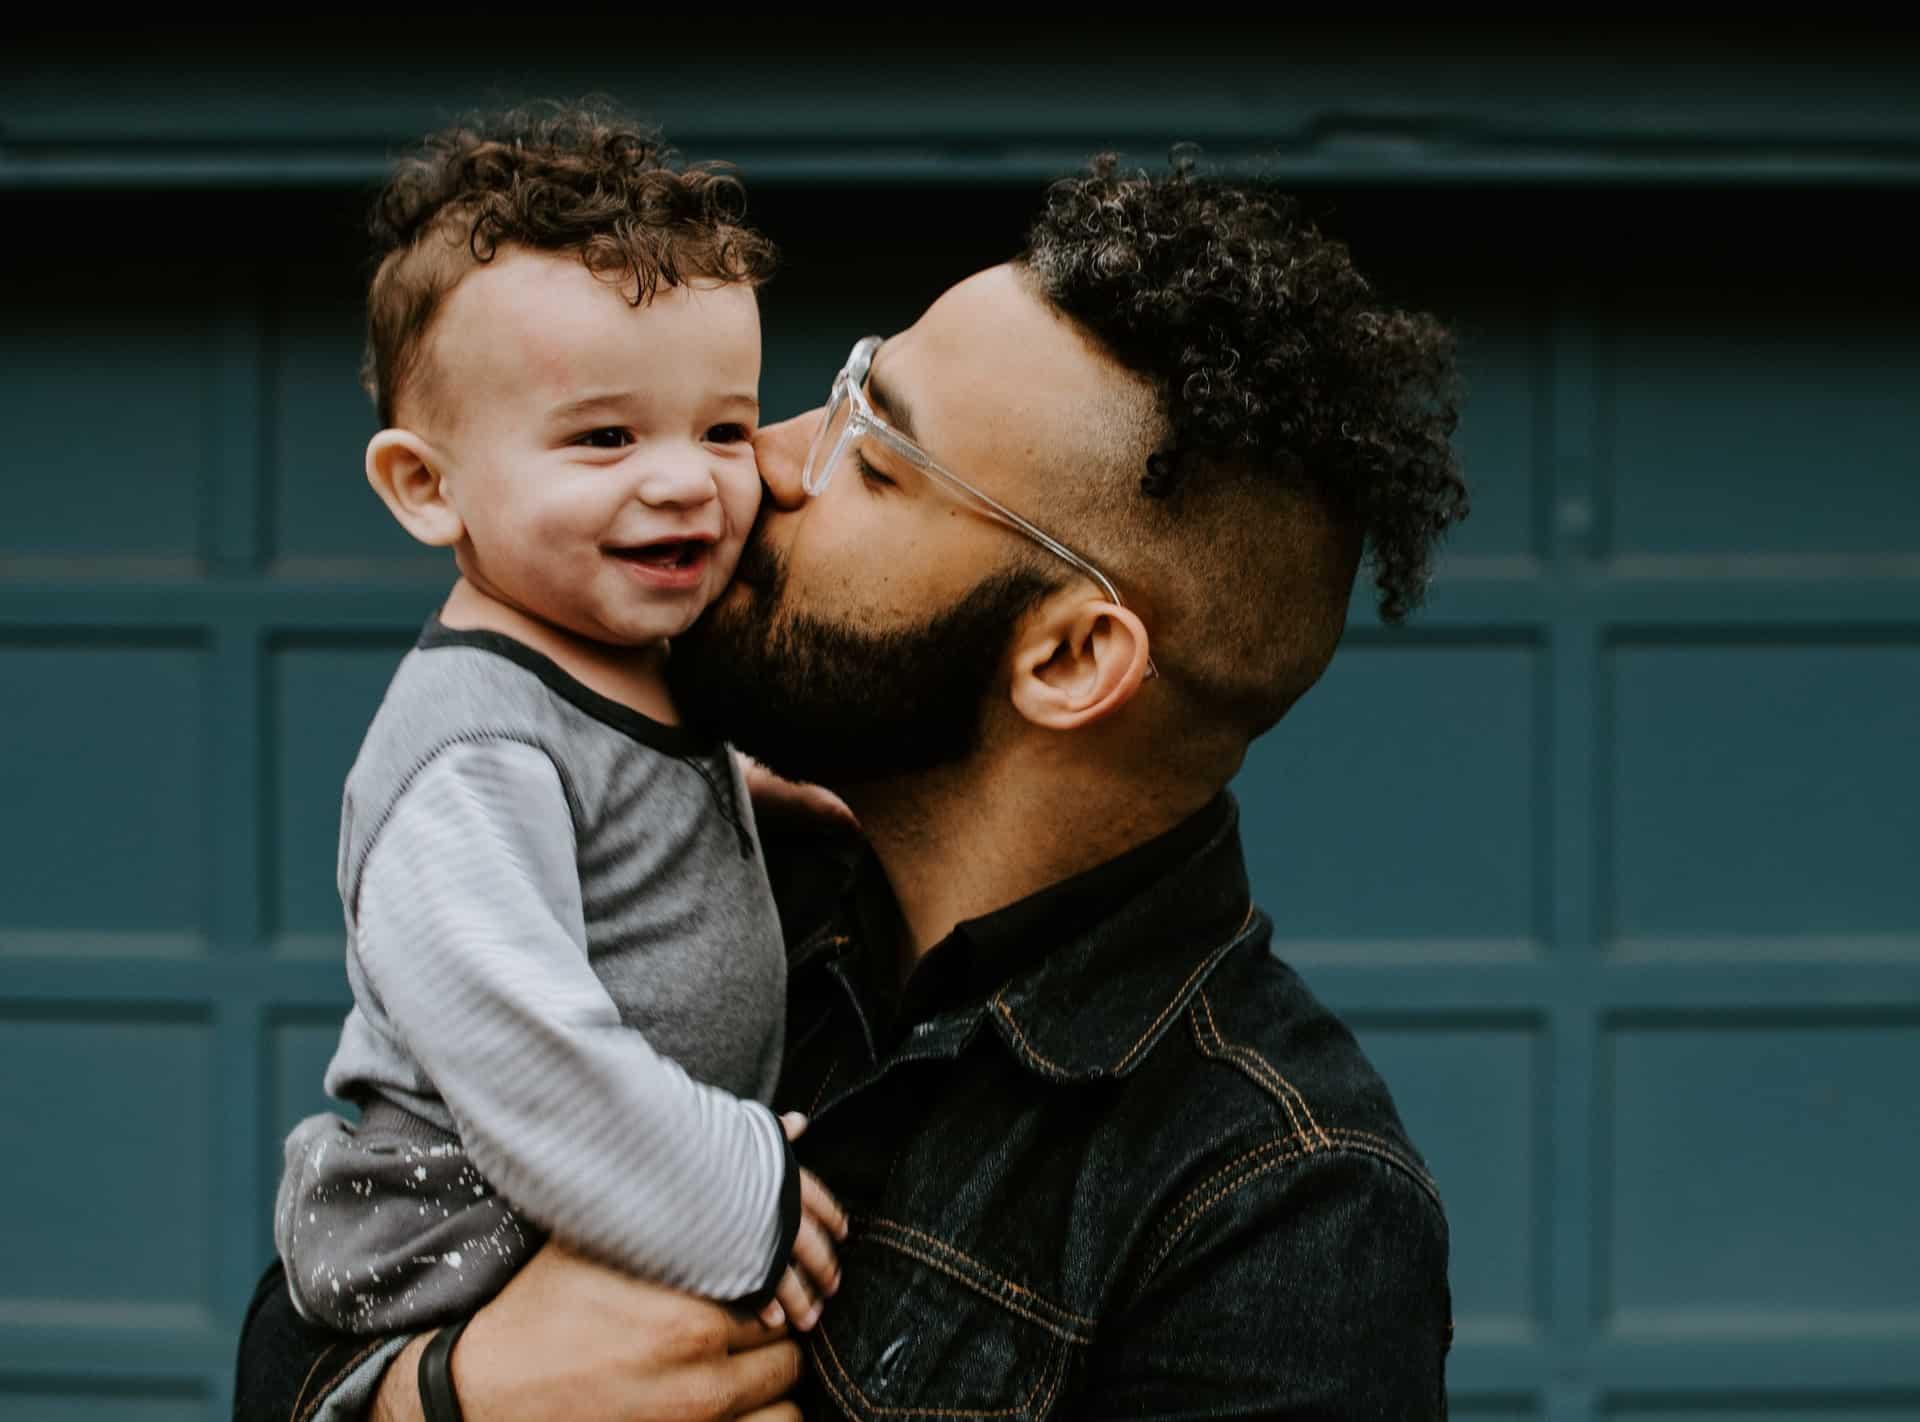 Guide Father Prepare Baby Header Image